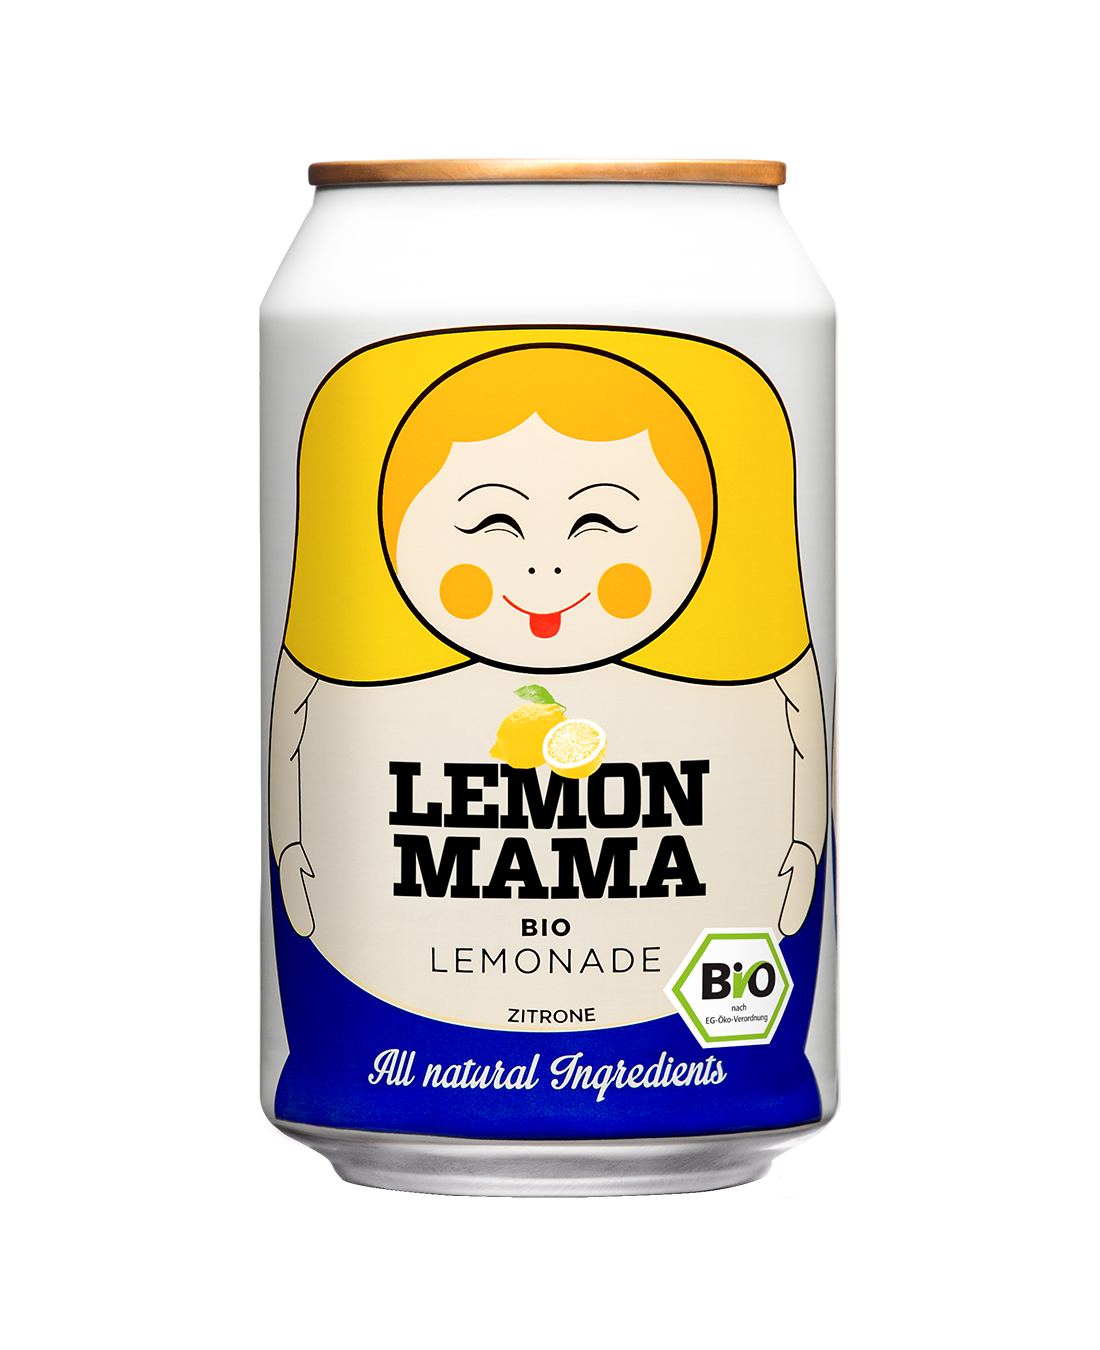 Lemon Mama Lemonade